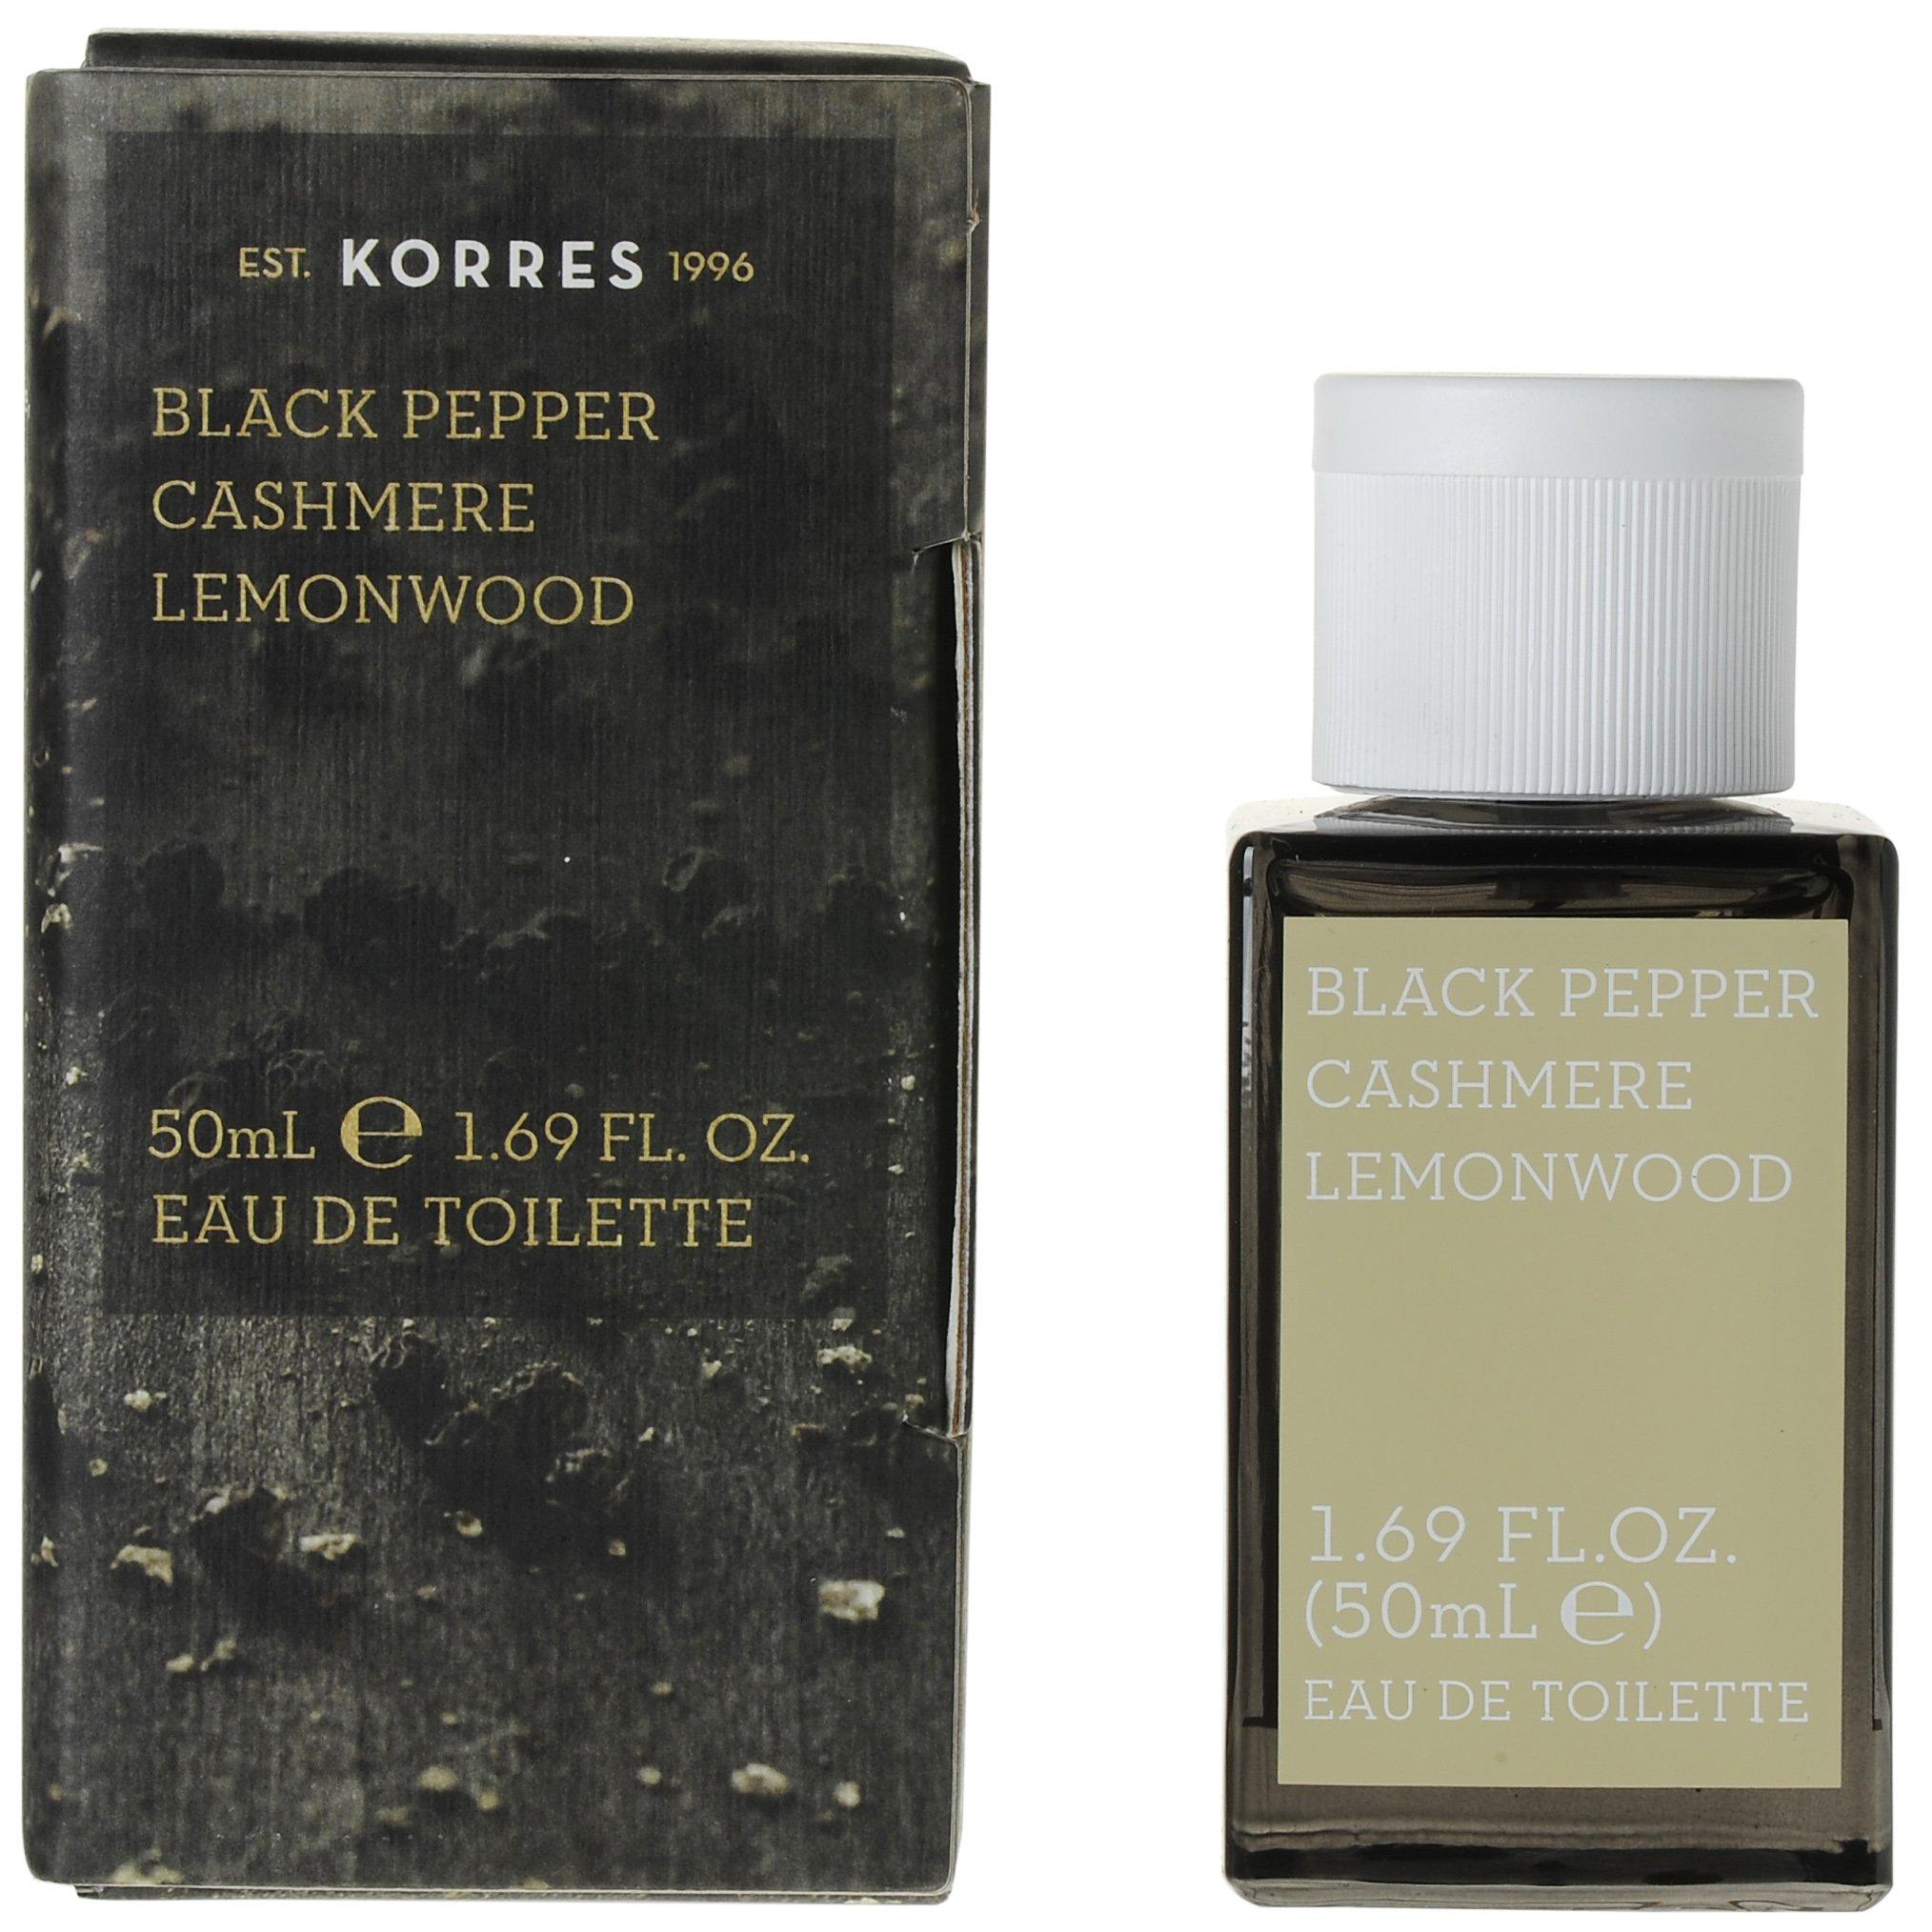 Korres Eau de Toilette Black Pepper, Cashmere & Lemonwood Ανδρικό Άρωμα50ml ομορφιά   αρώματα   αρώματα για τον άνδρα